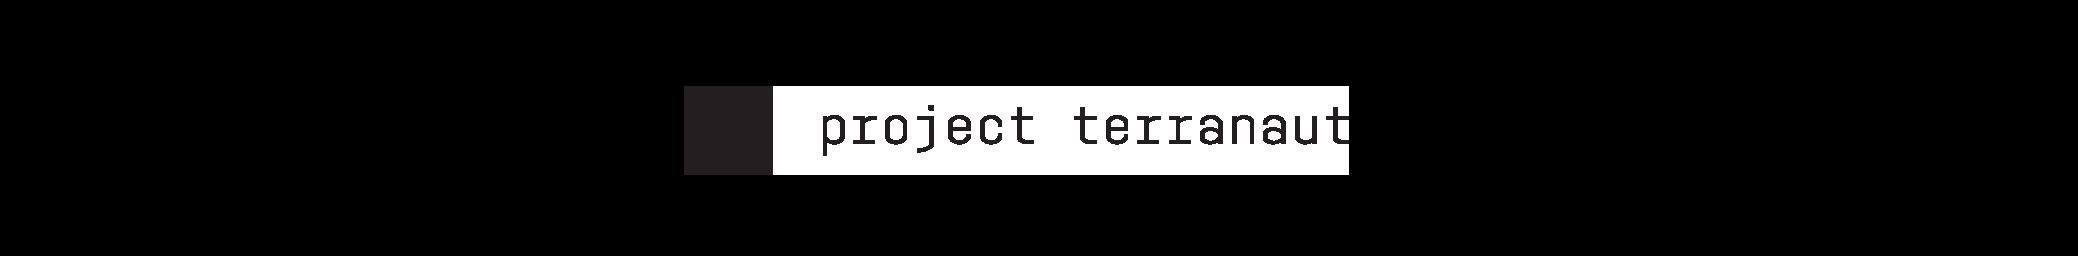 project terranaut logo.png